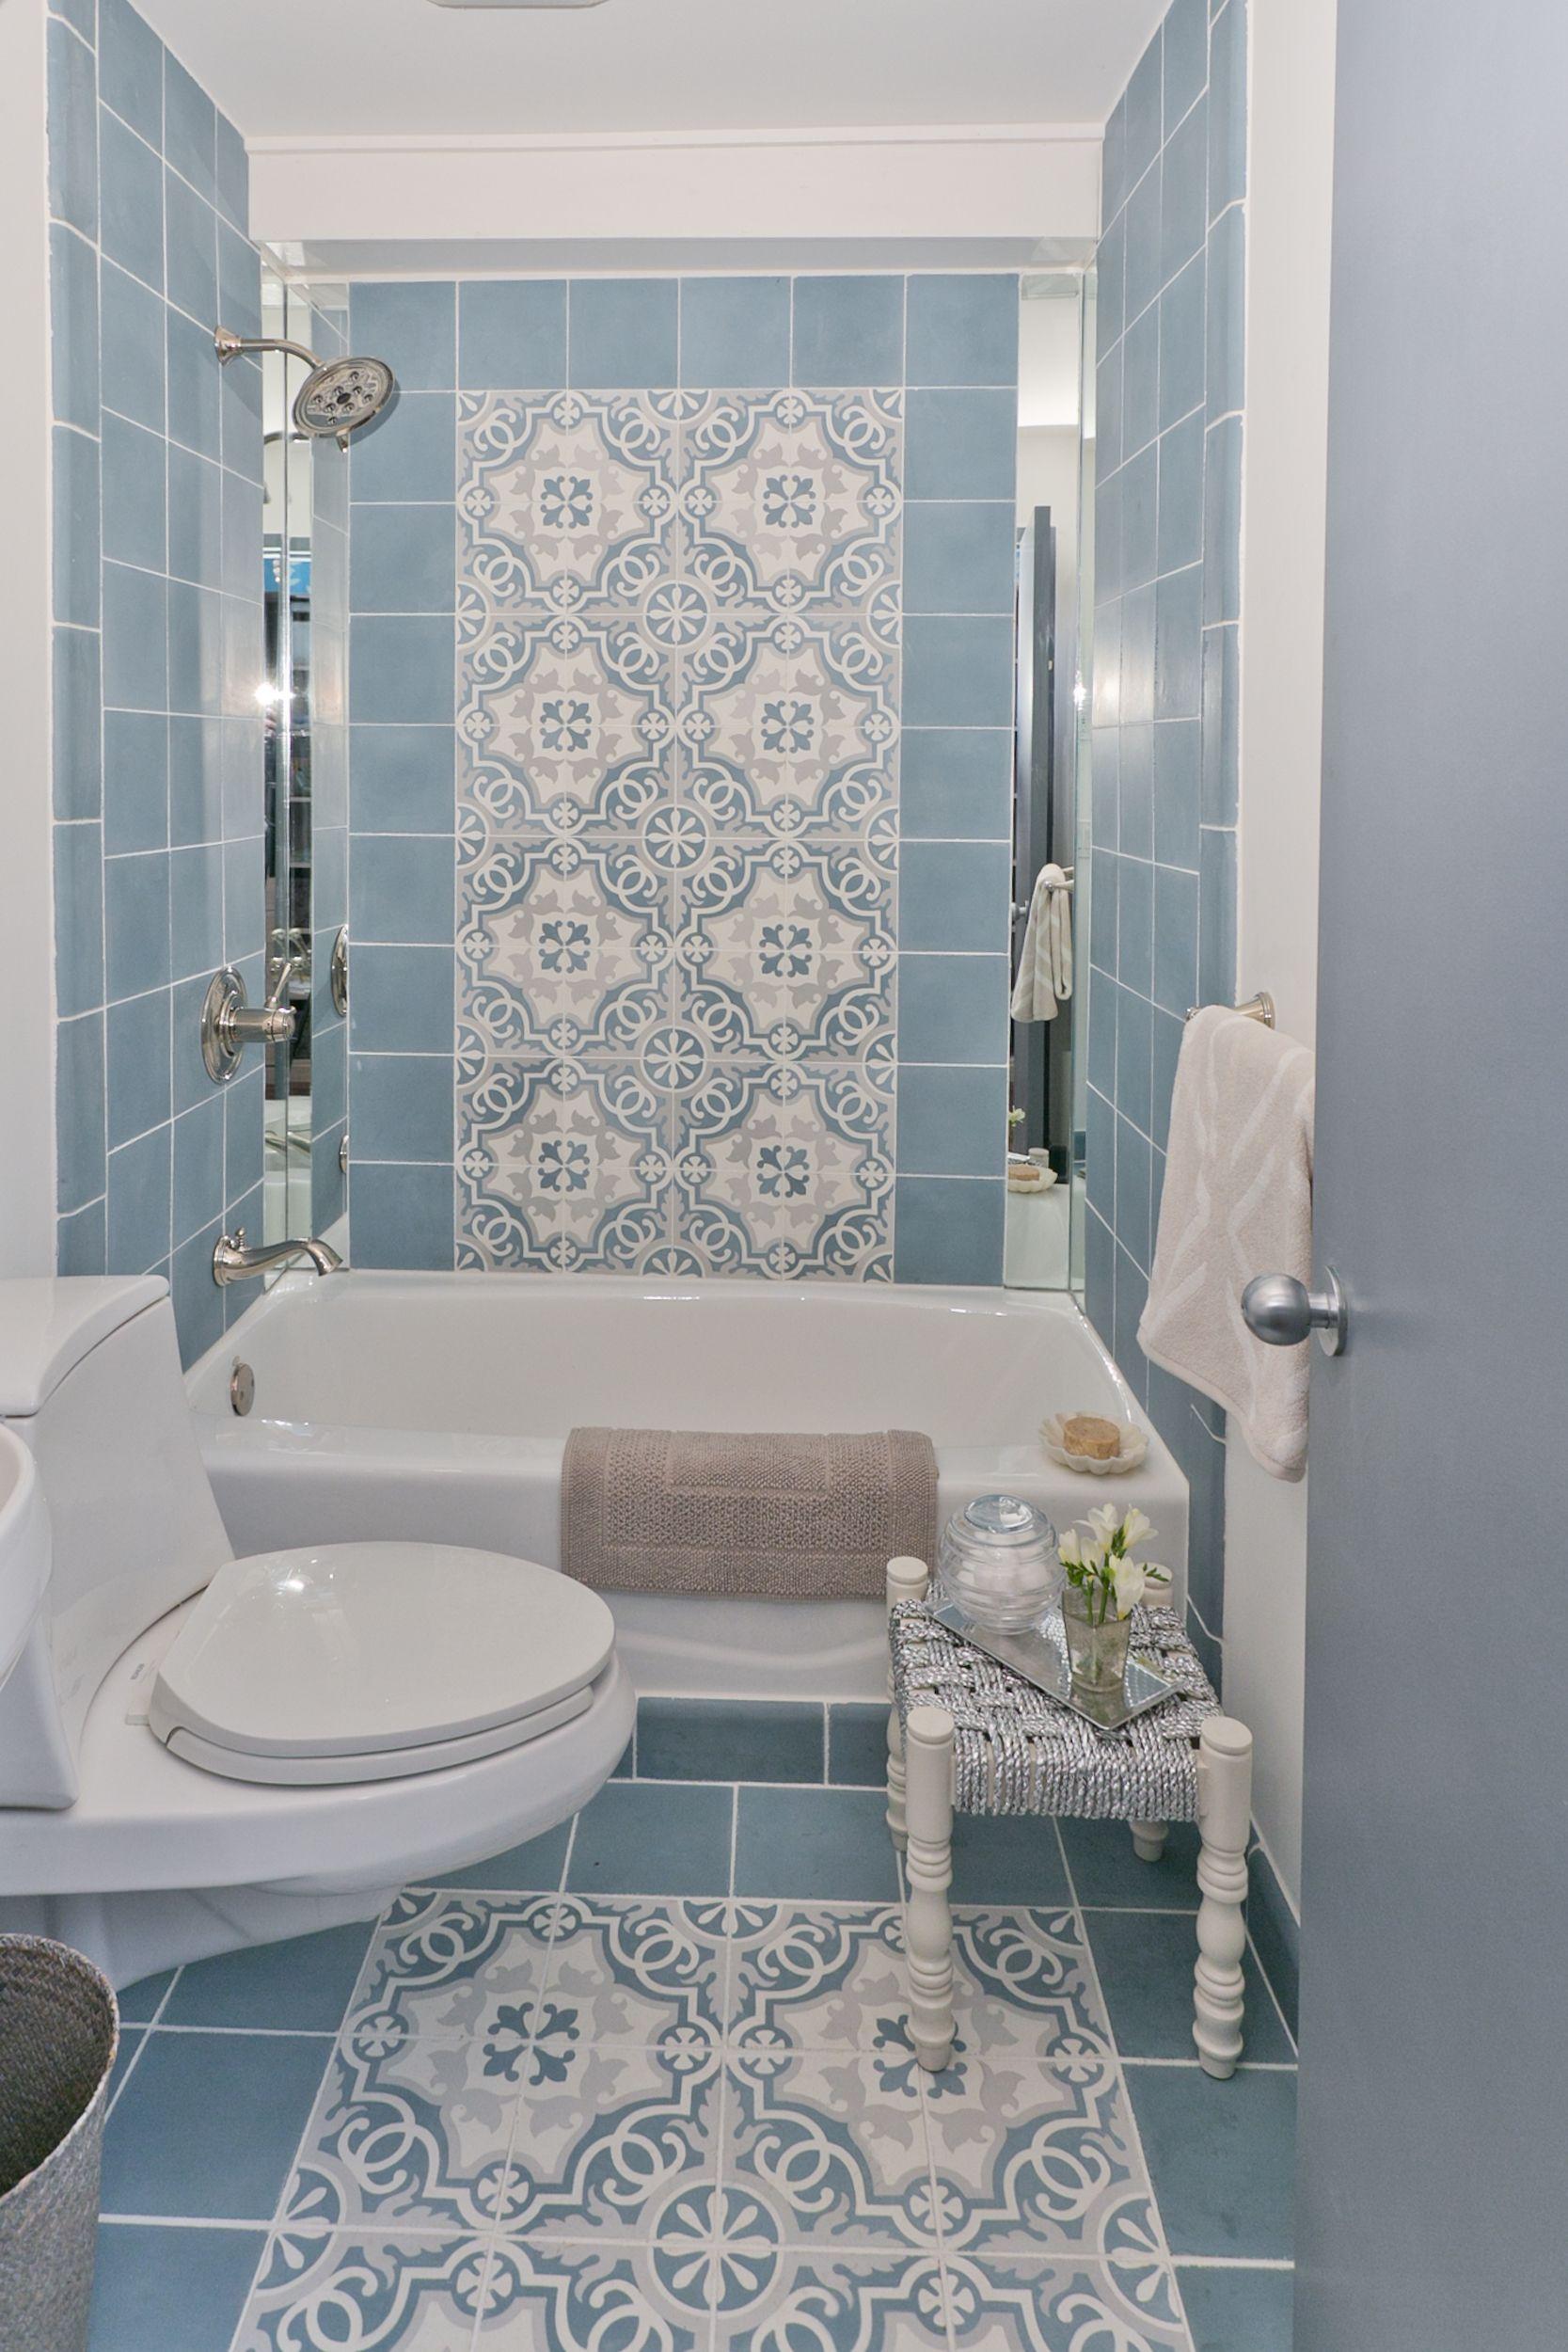 Tile Bathroom Designs Simple Cement Tile Bathroom  Google Search  Bathroom Remodel Ideas Inspiration